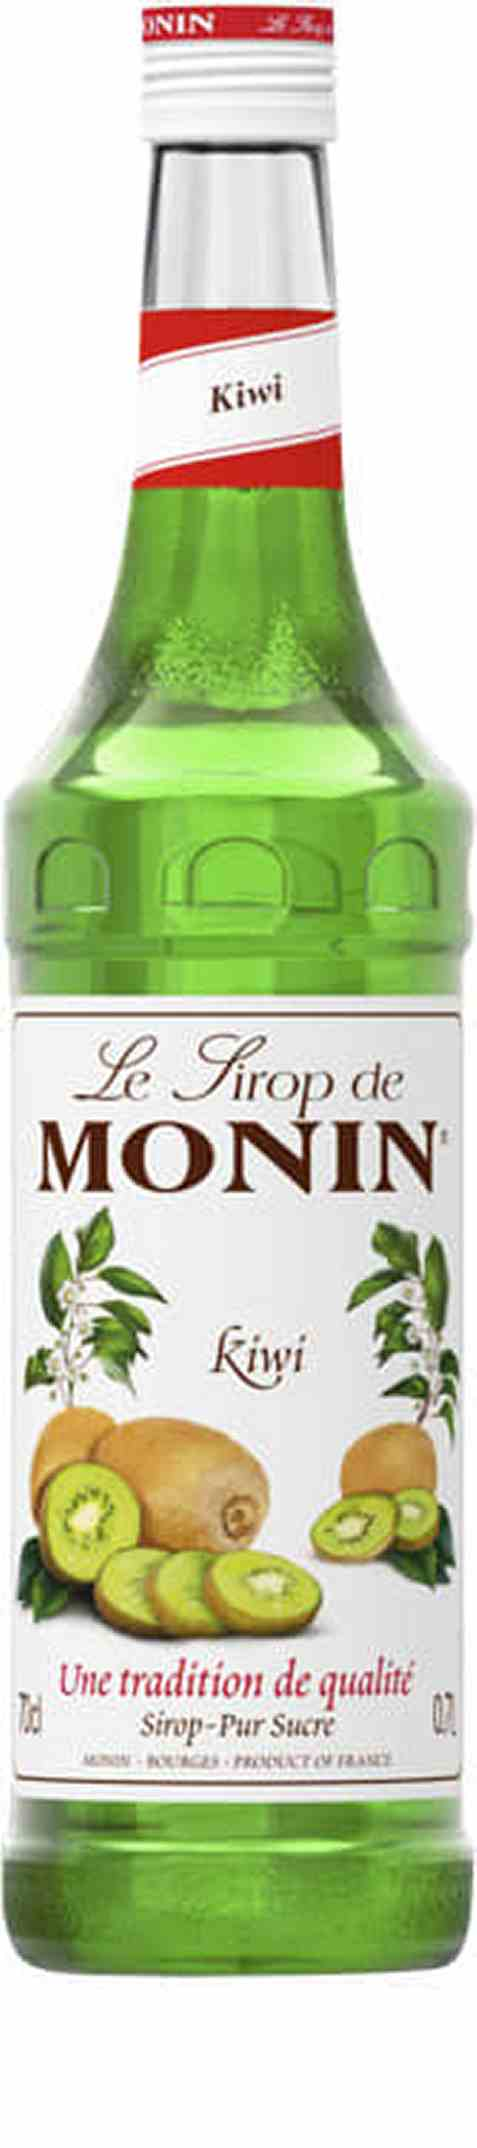 Bilde av Monin kiwi sirup.